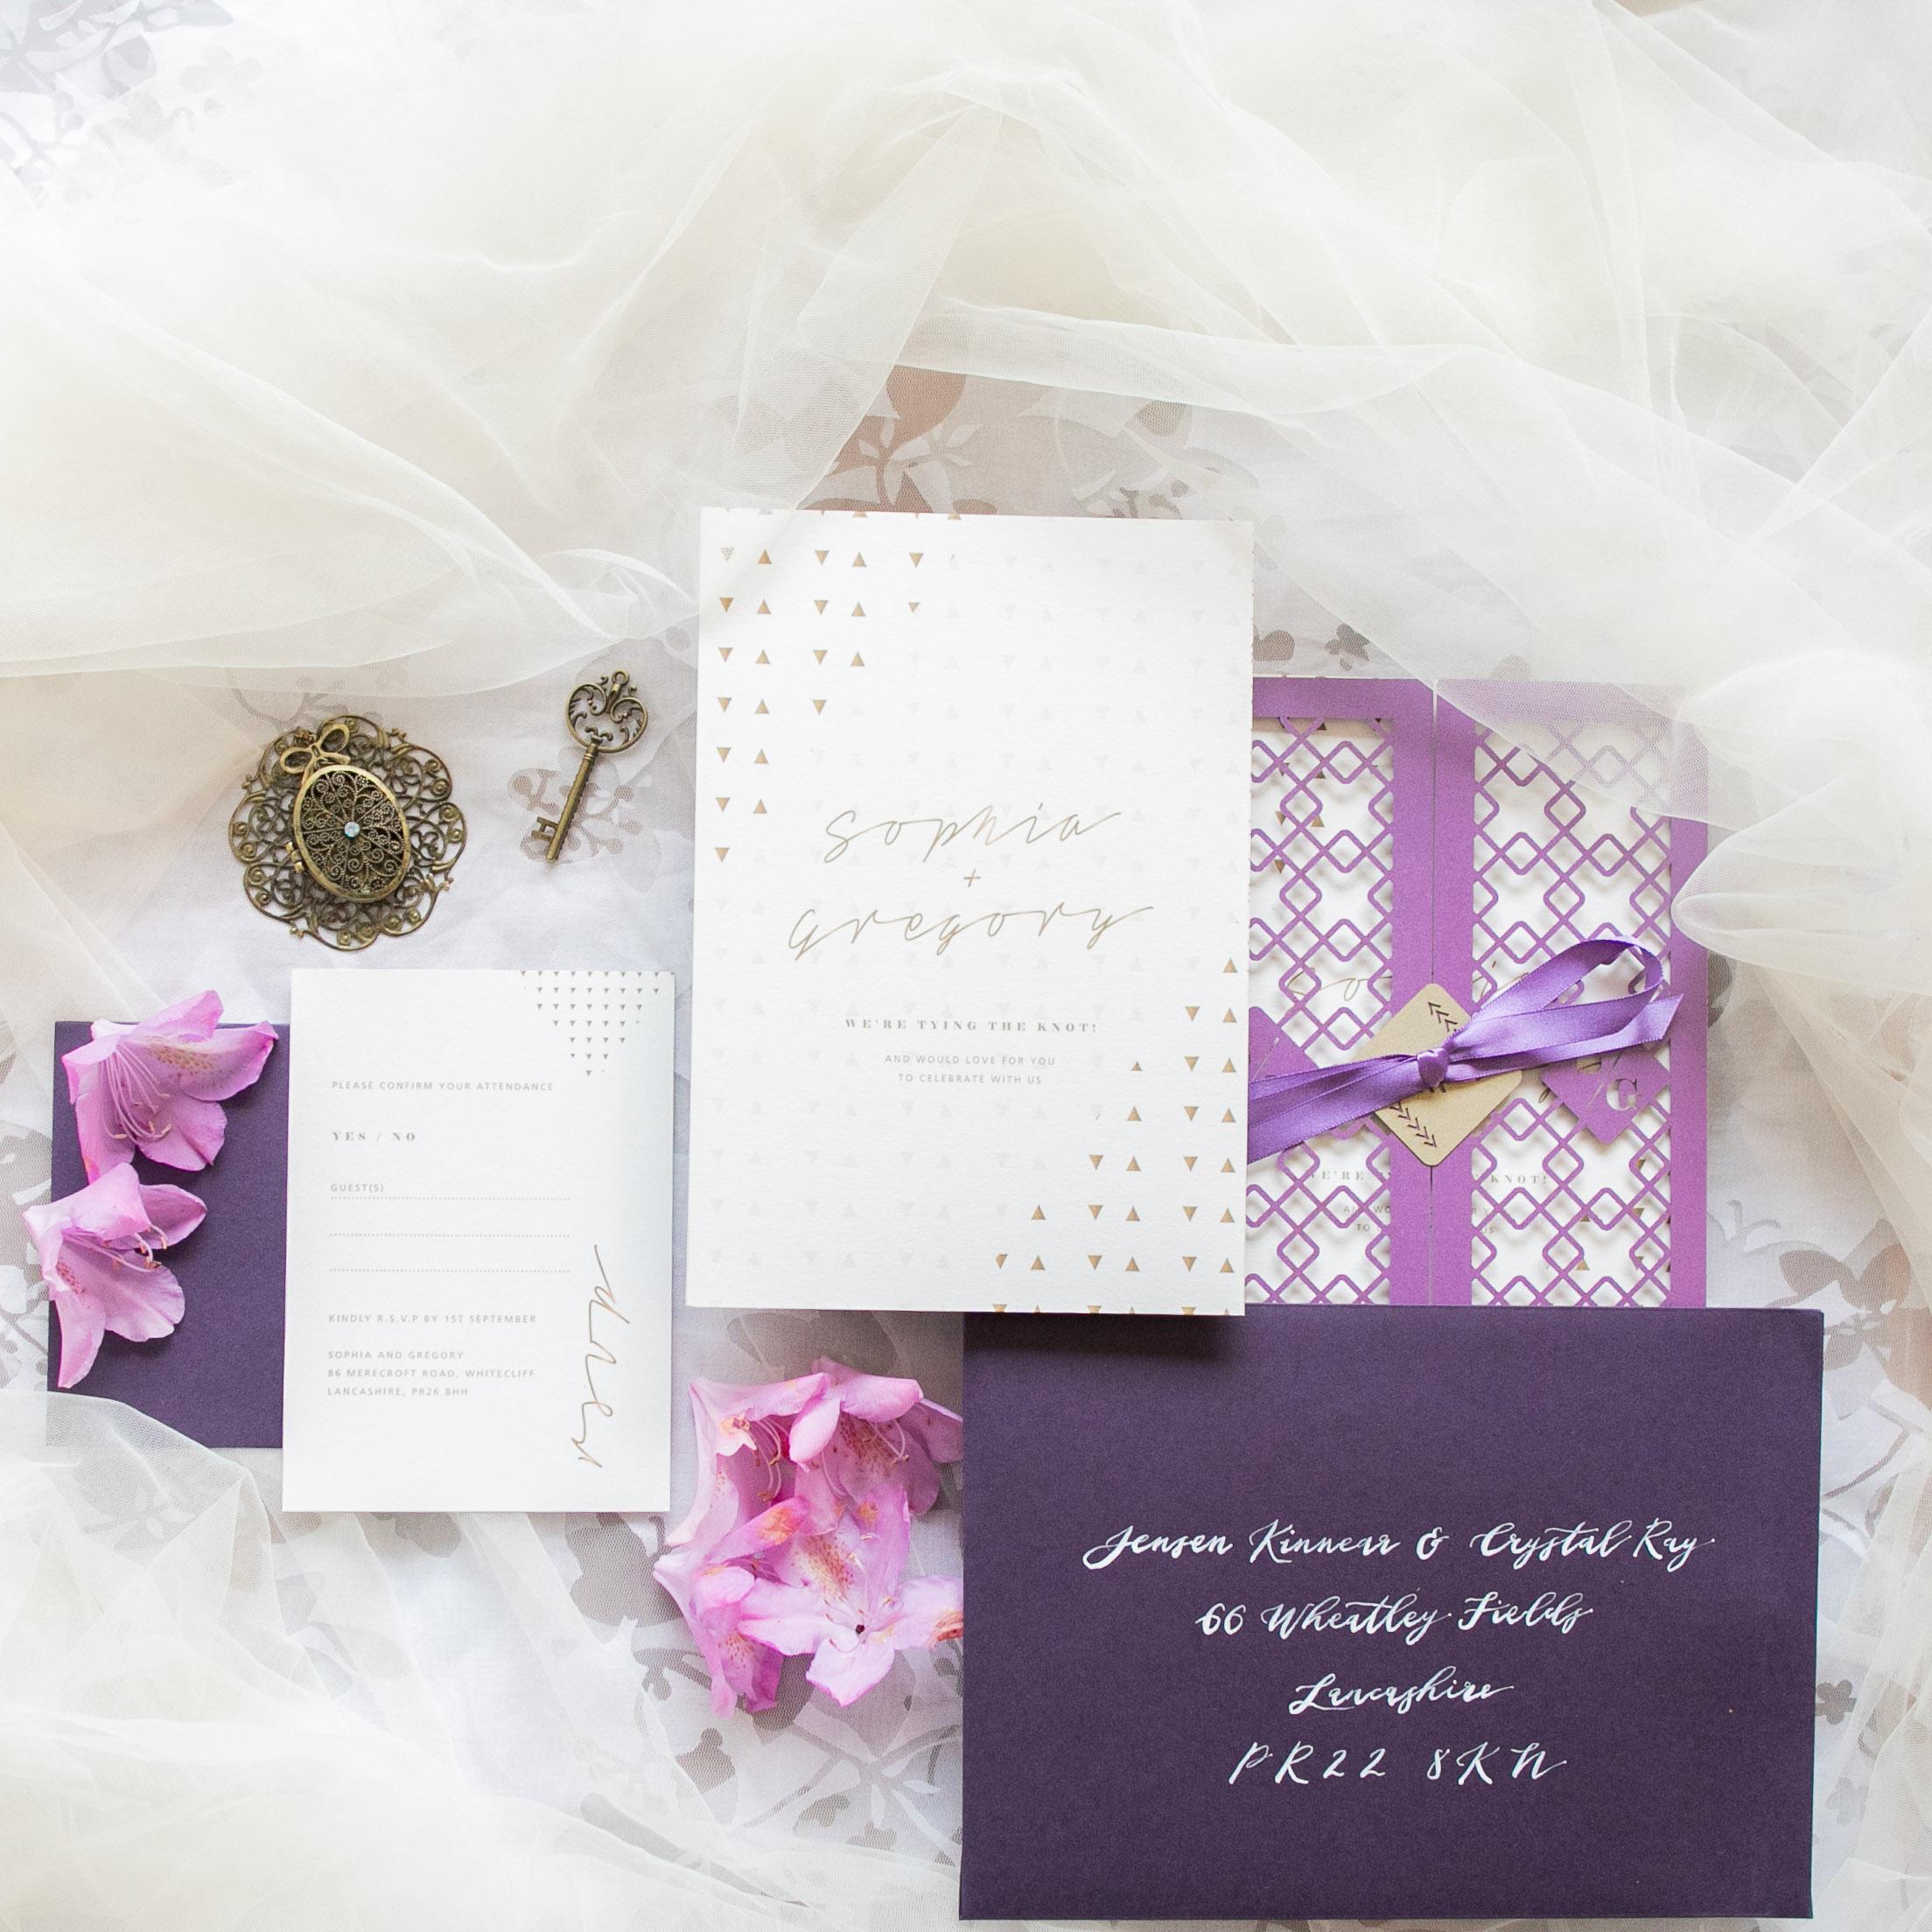 cross-eyed-fox-invitations-viviana-podhaiski-photography-7.jpg